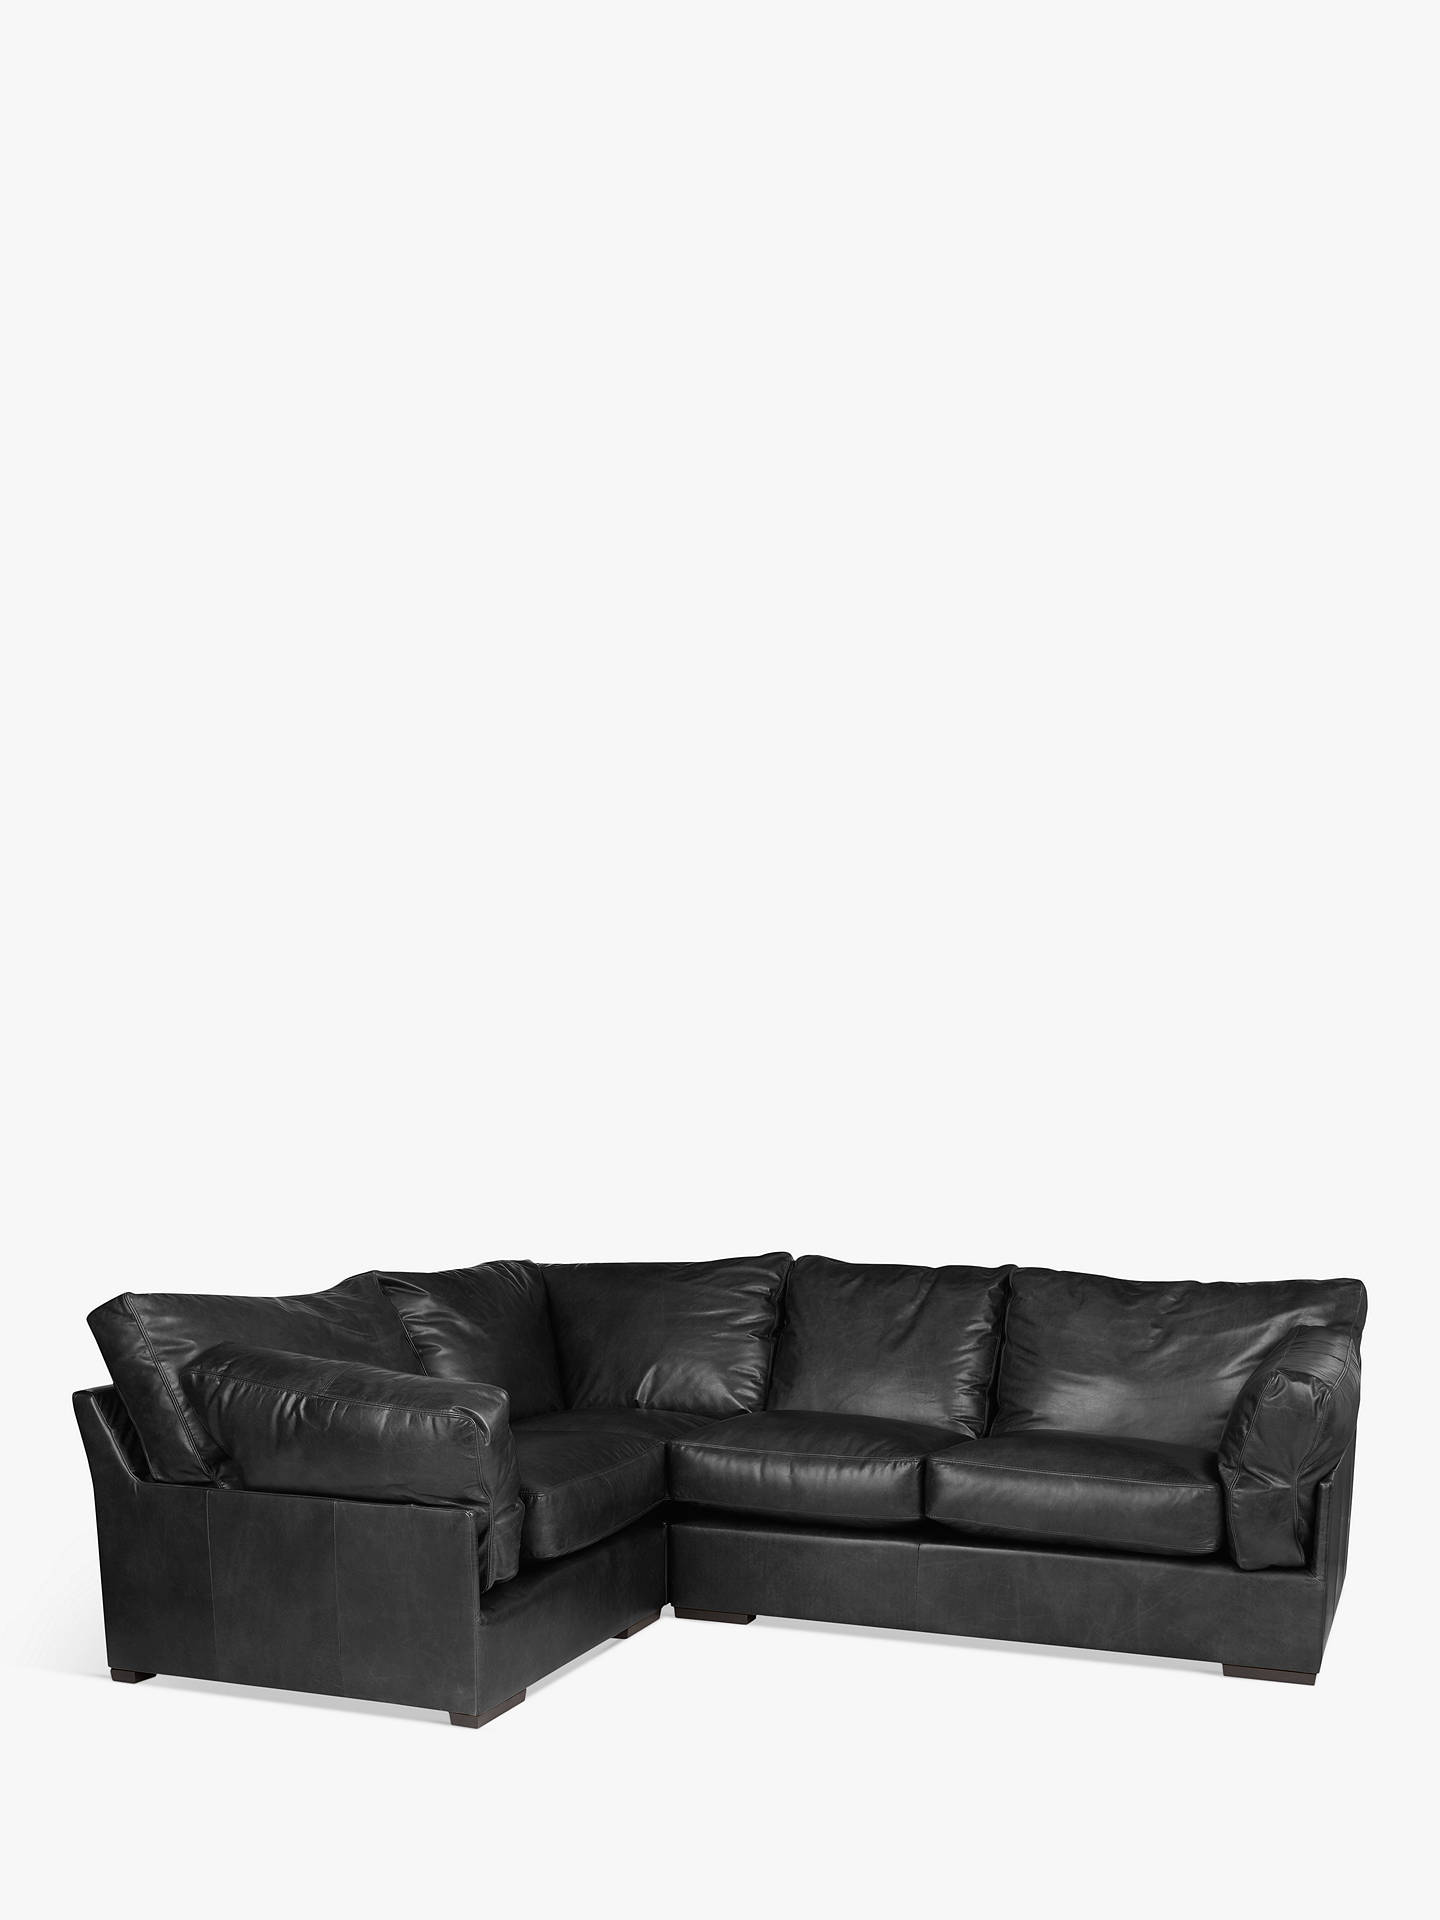 John Lewis & Partners Java LHF Corner Leather Sofa, Dark Leg, Contempo Black